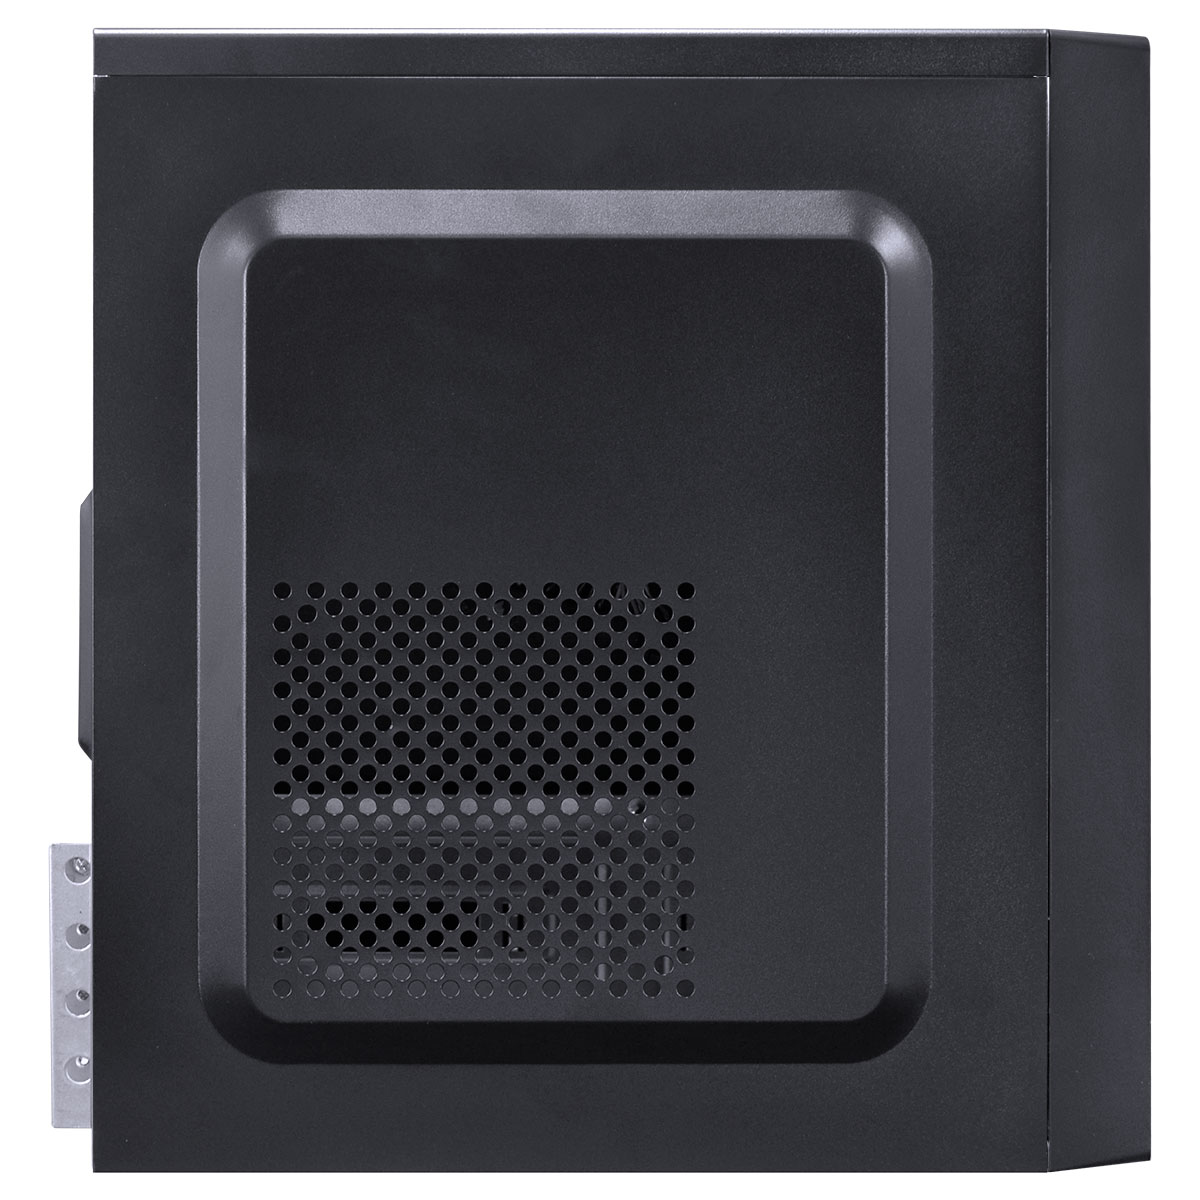 COMPUTADOR HOME H100 - CELERON DUAL CORE J1800 2.41GHZ 4GB DDR3 SODIMM SSD 120GB HDMI/VGA FONTE 200W